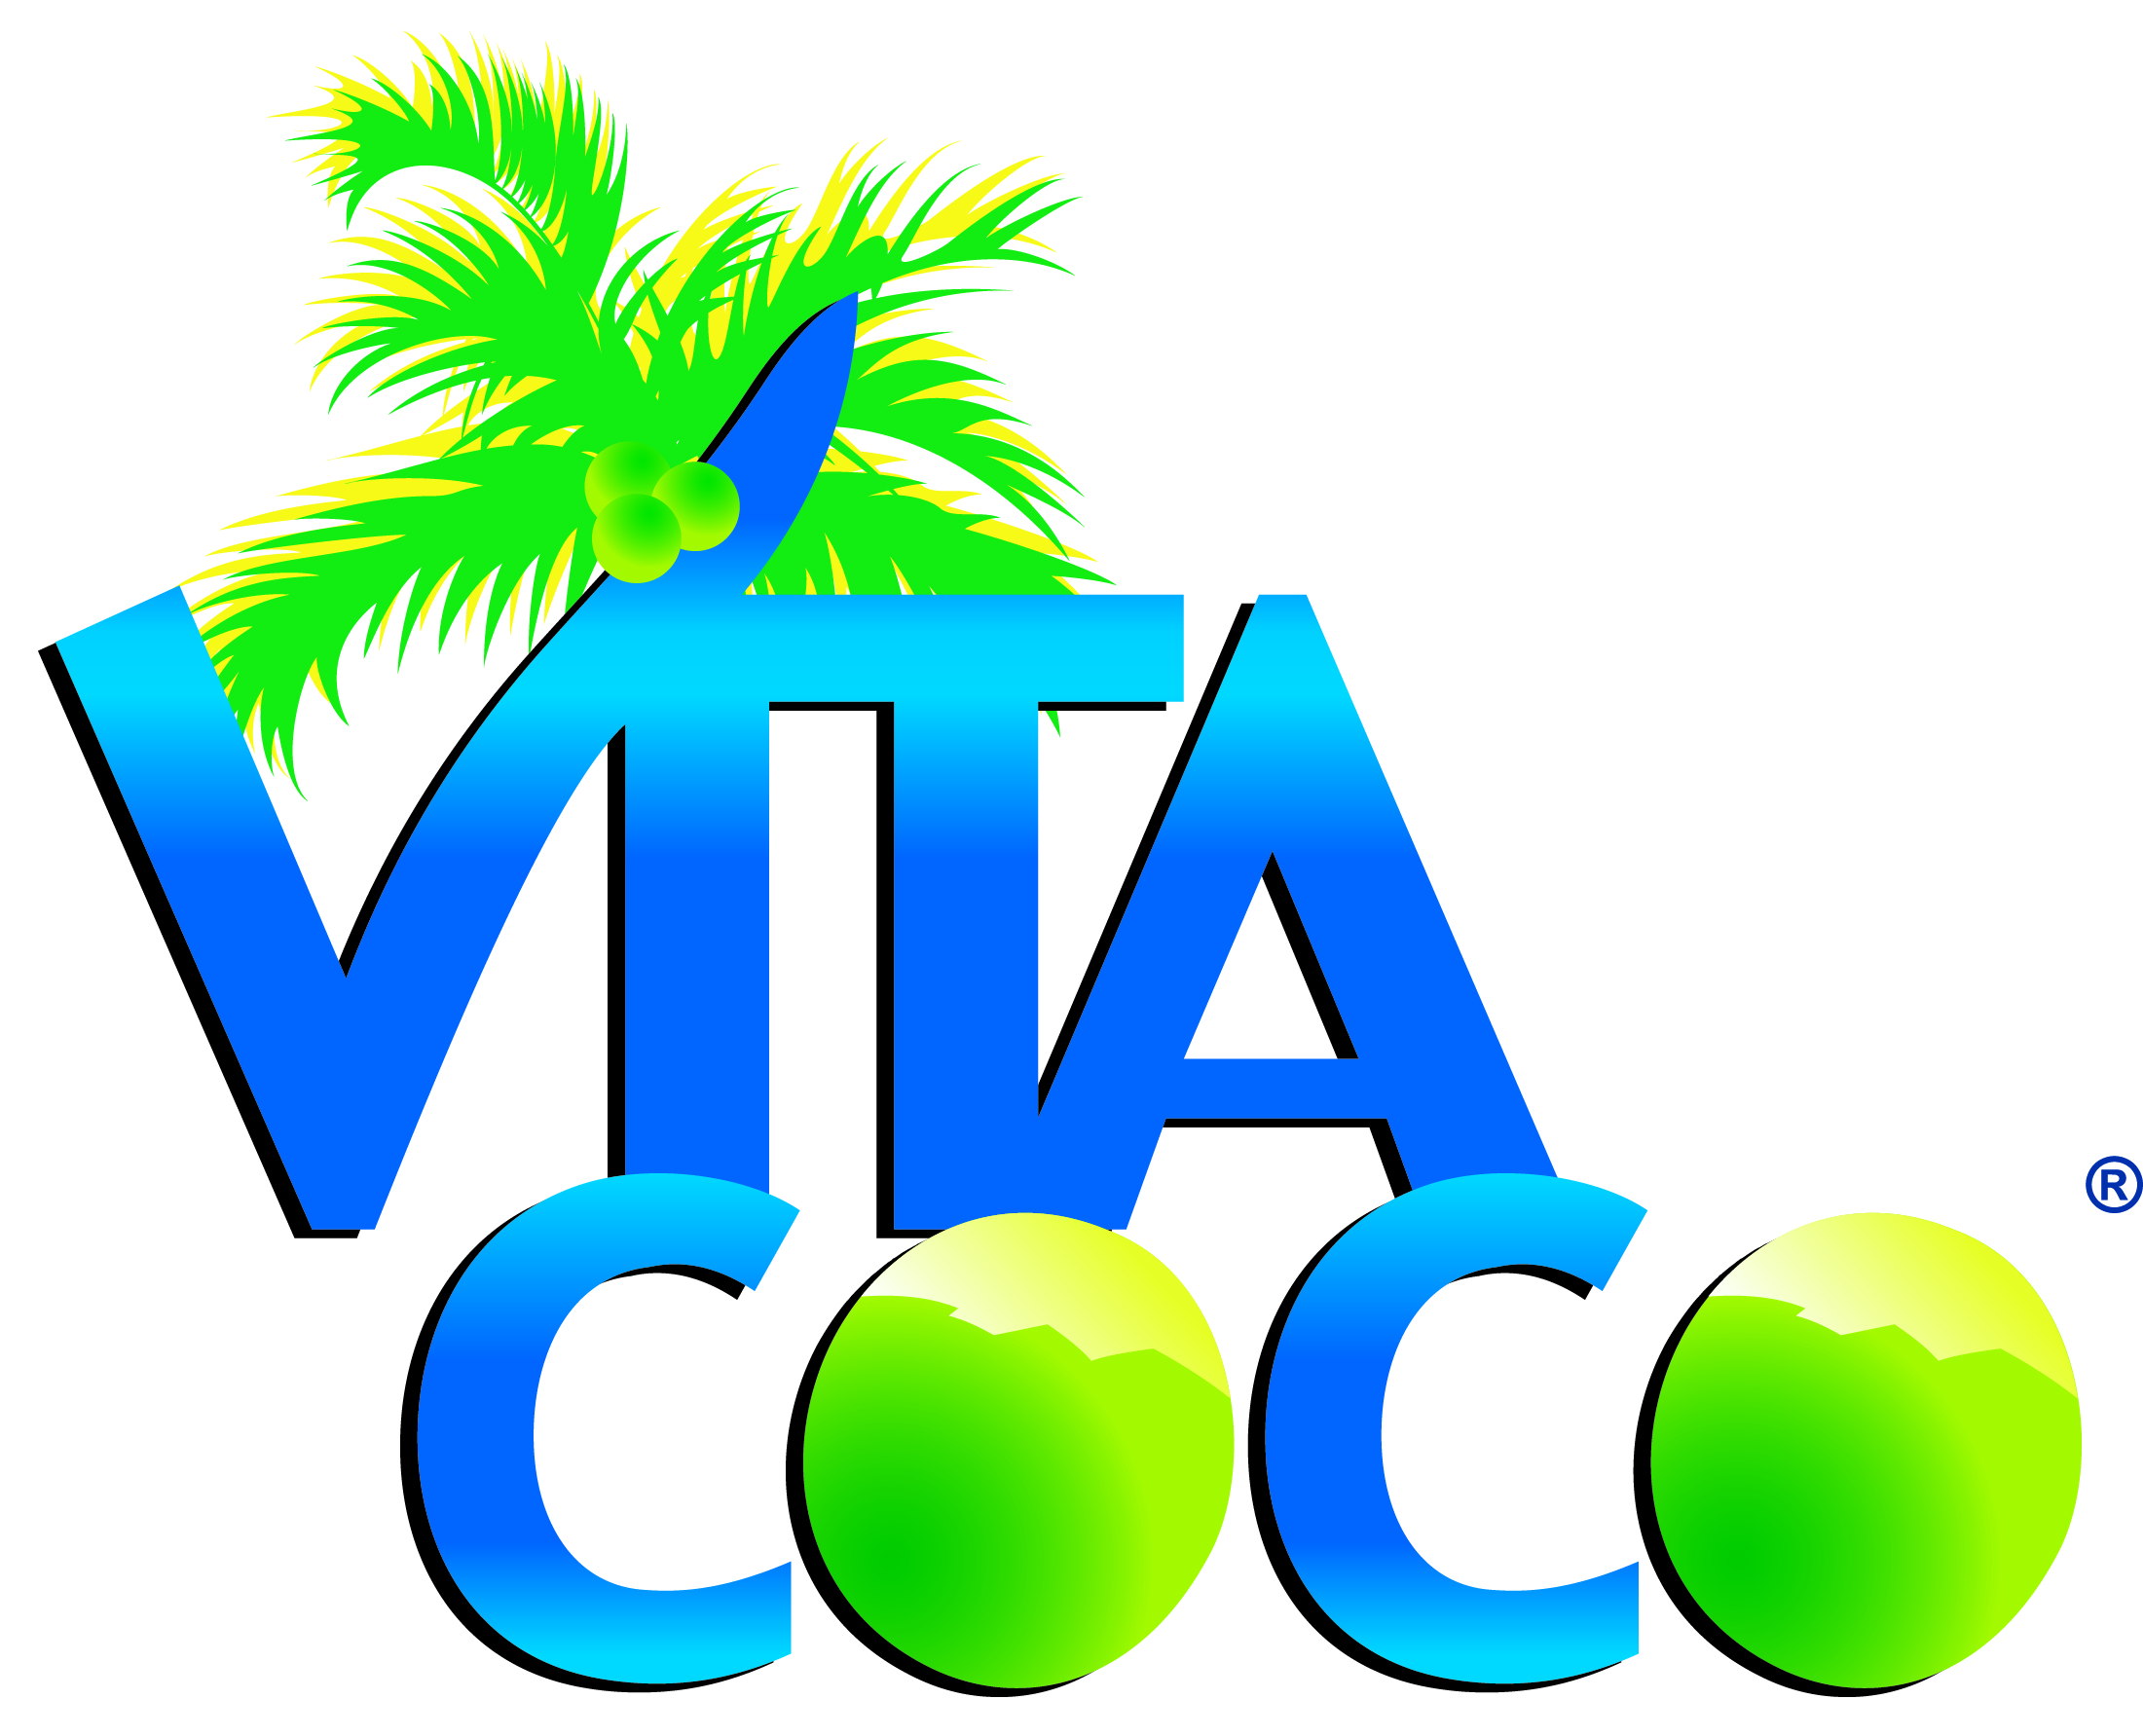 vc_logo_no-cocowater_tag Jpeg (1).jpg